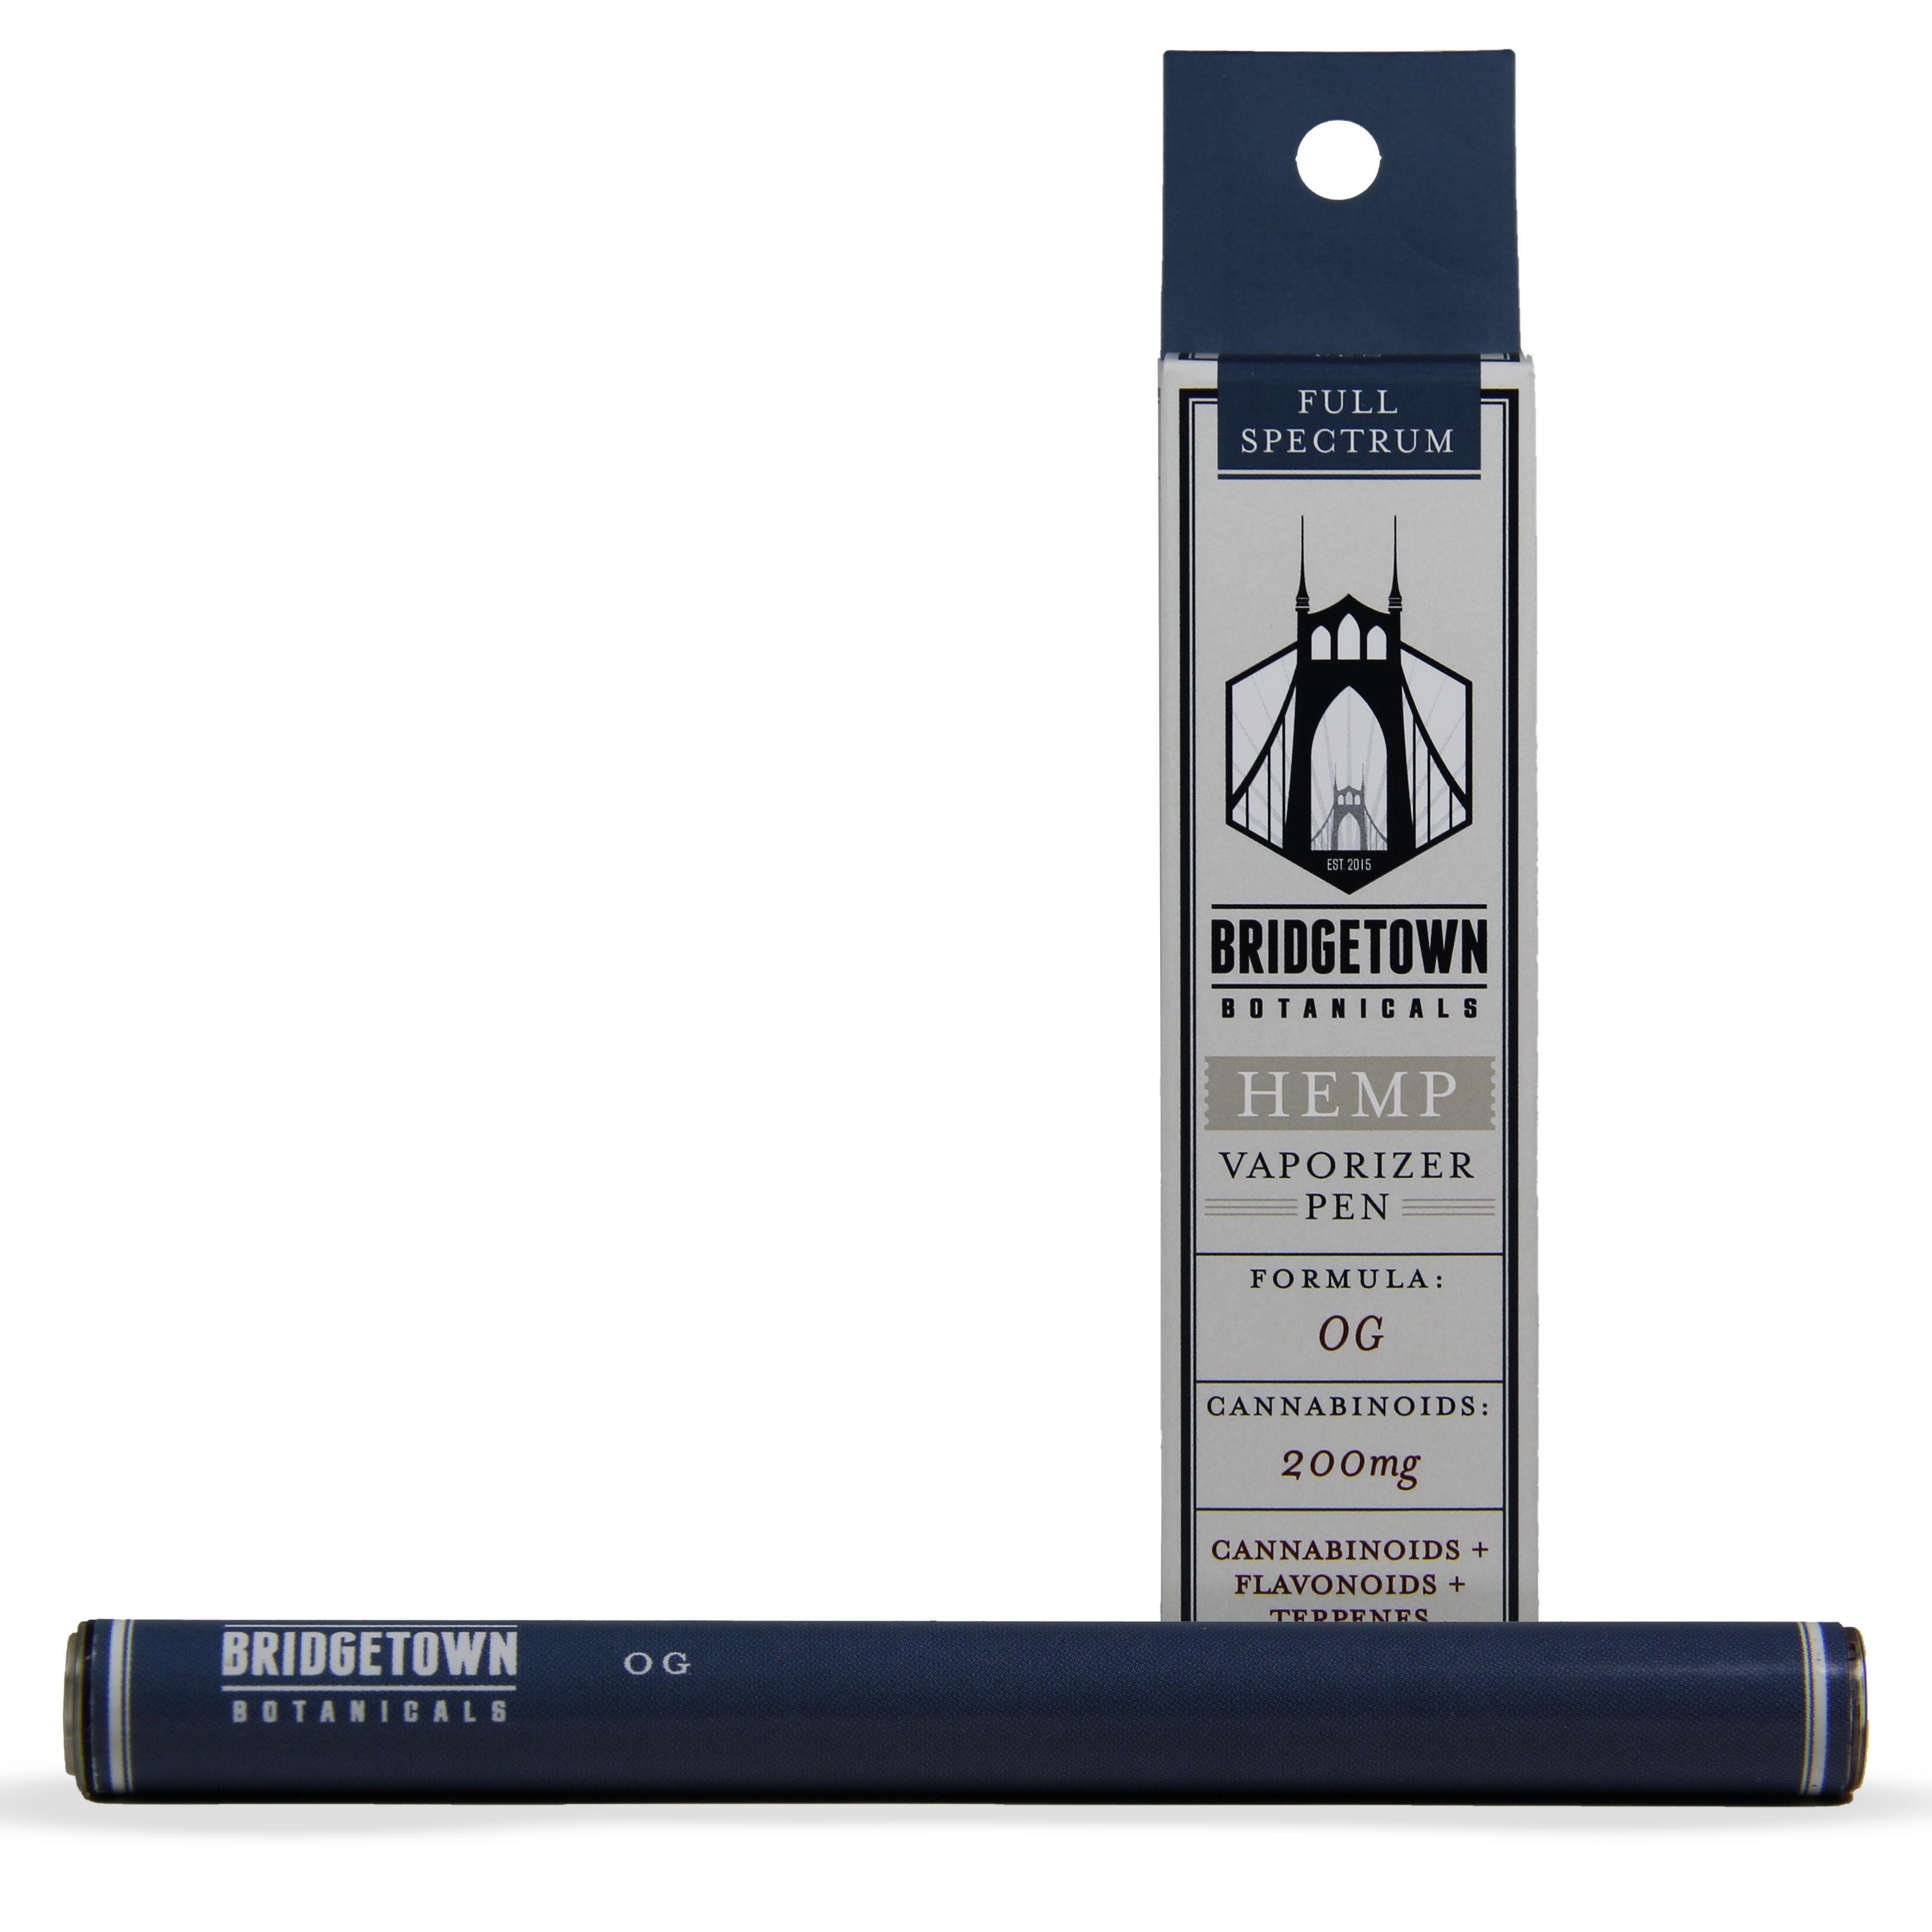 Hemp Vaporizer Pen - 200mg (OG)